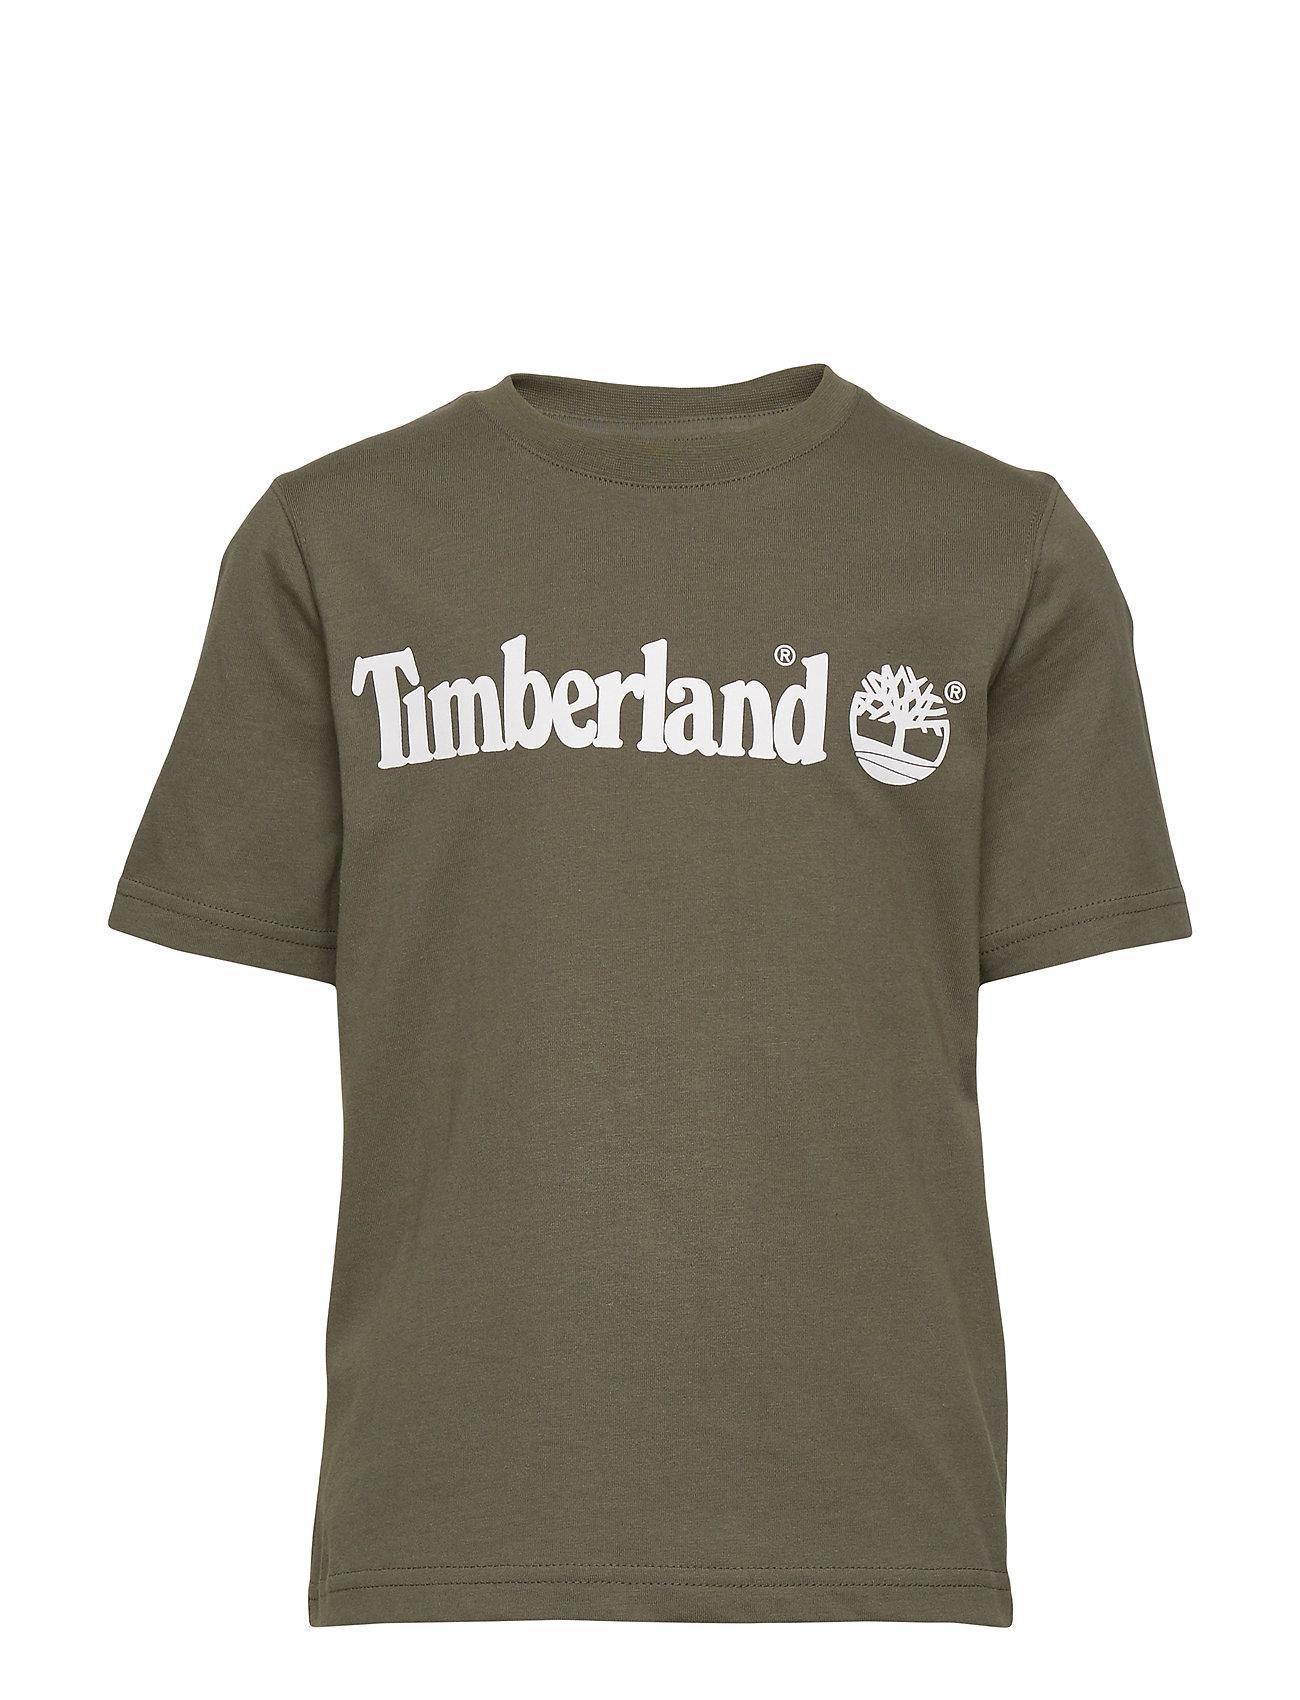 Timberland SHORT SLEEVES TEE-SHIRT - GREEN